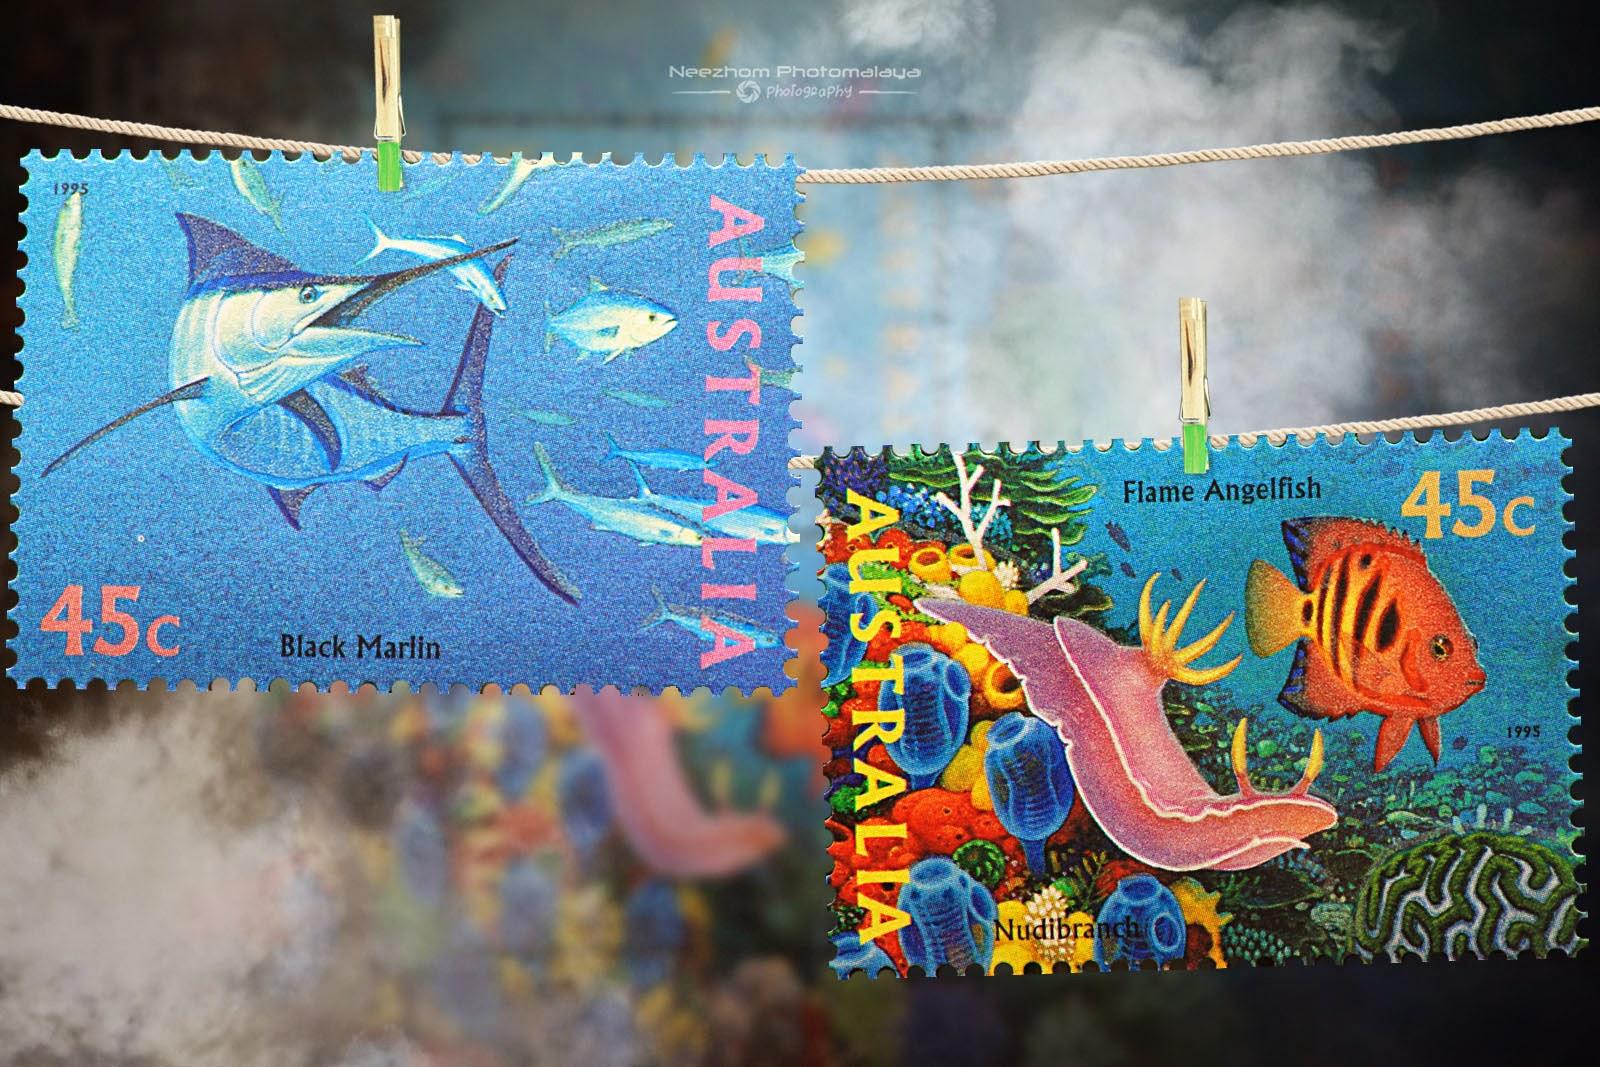 Australia 1995 The World Down Under stamps - Black martin, Nudibranch, Flame angelfish